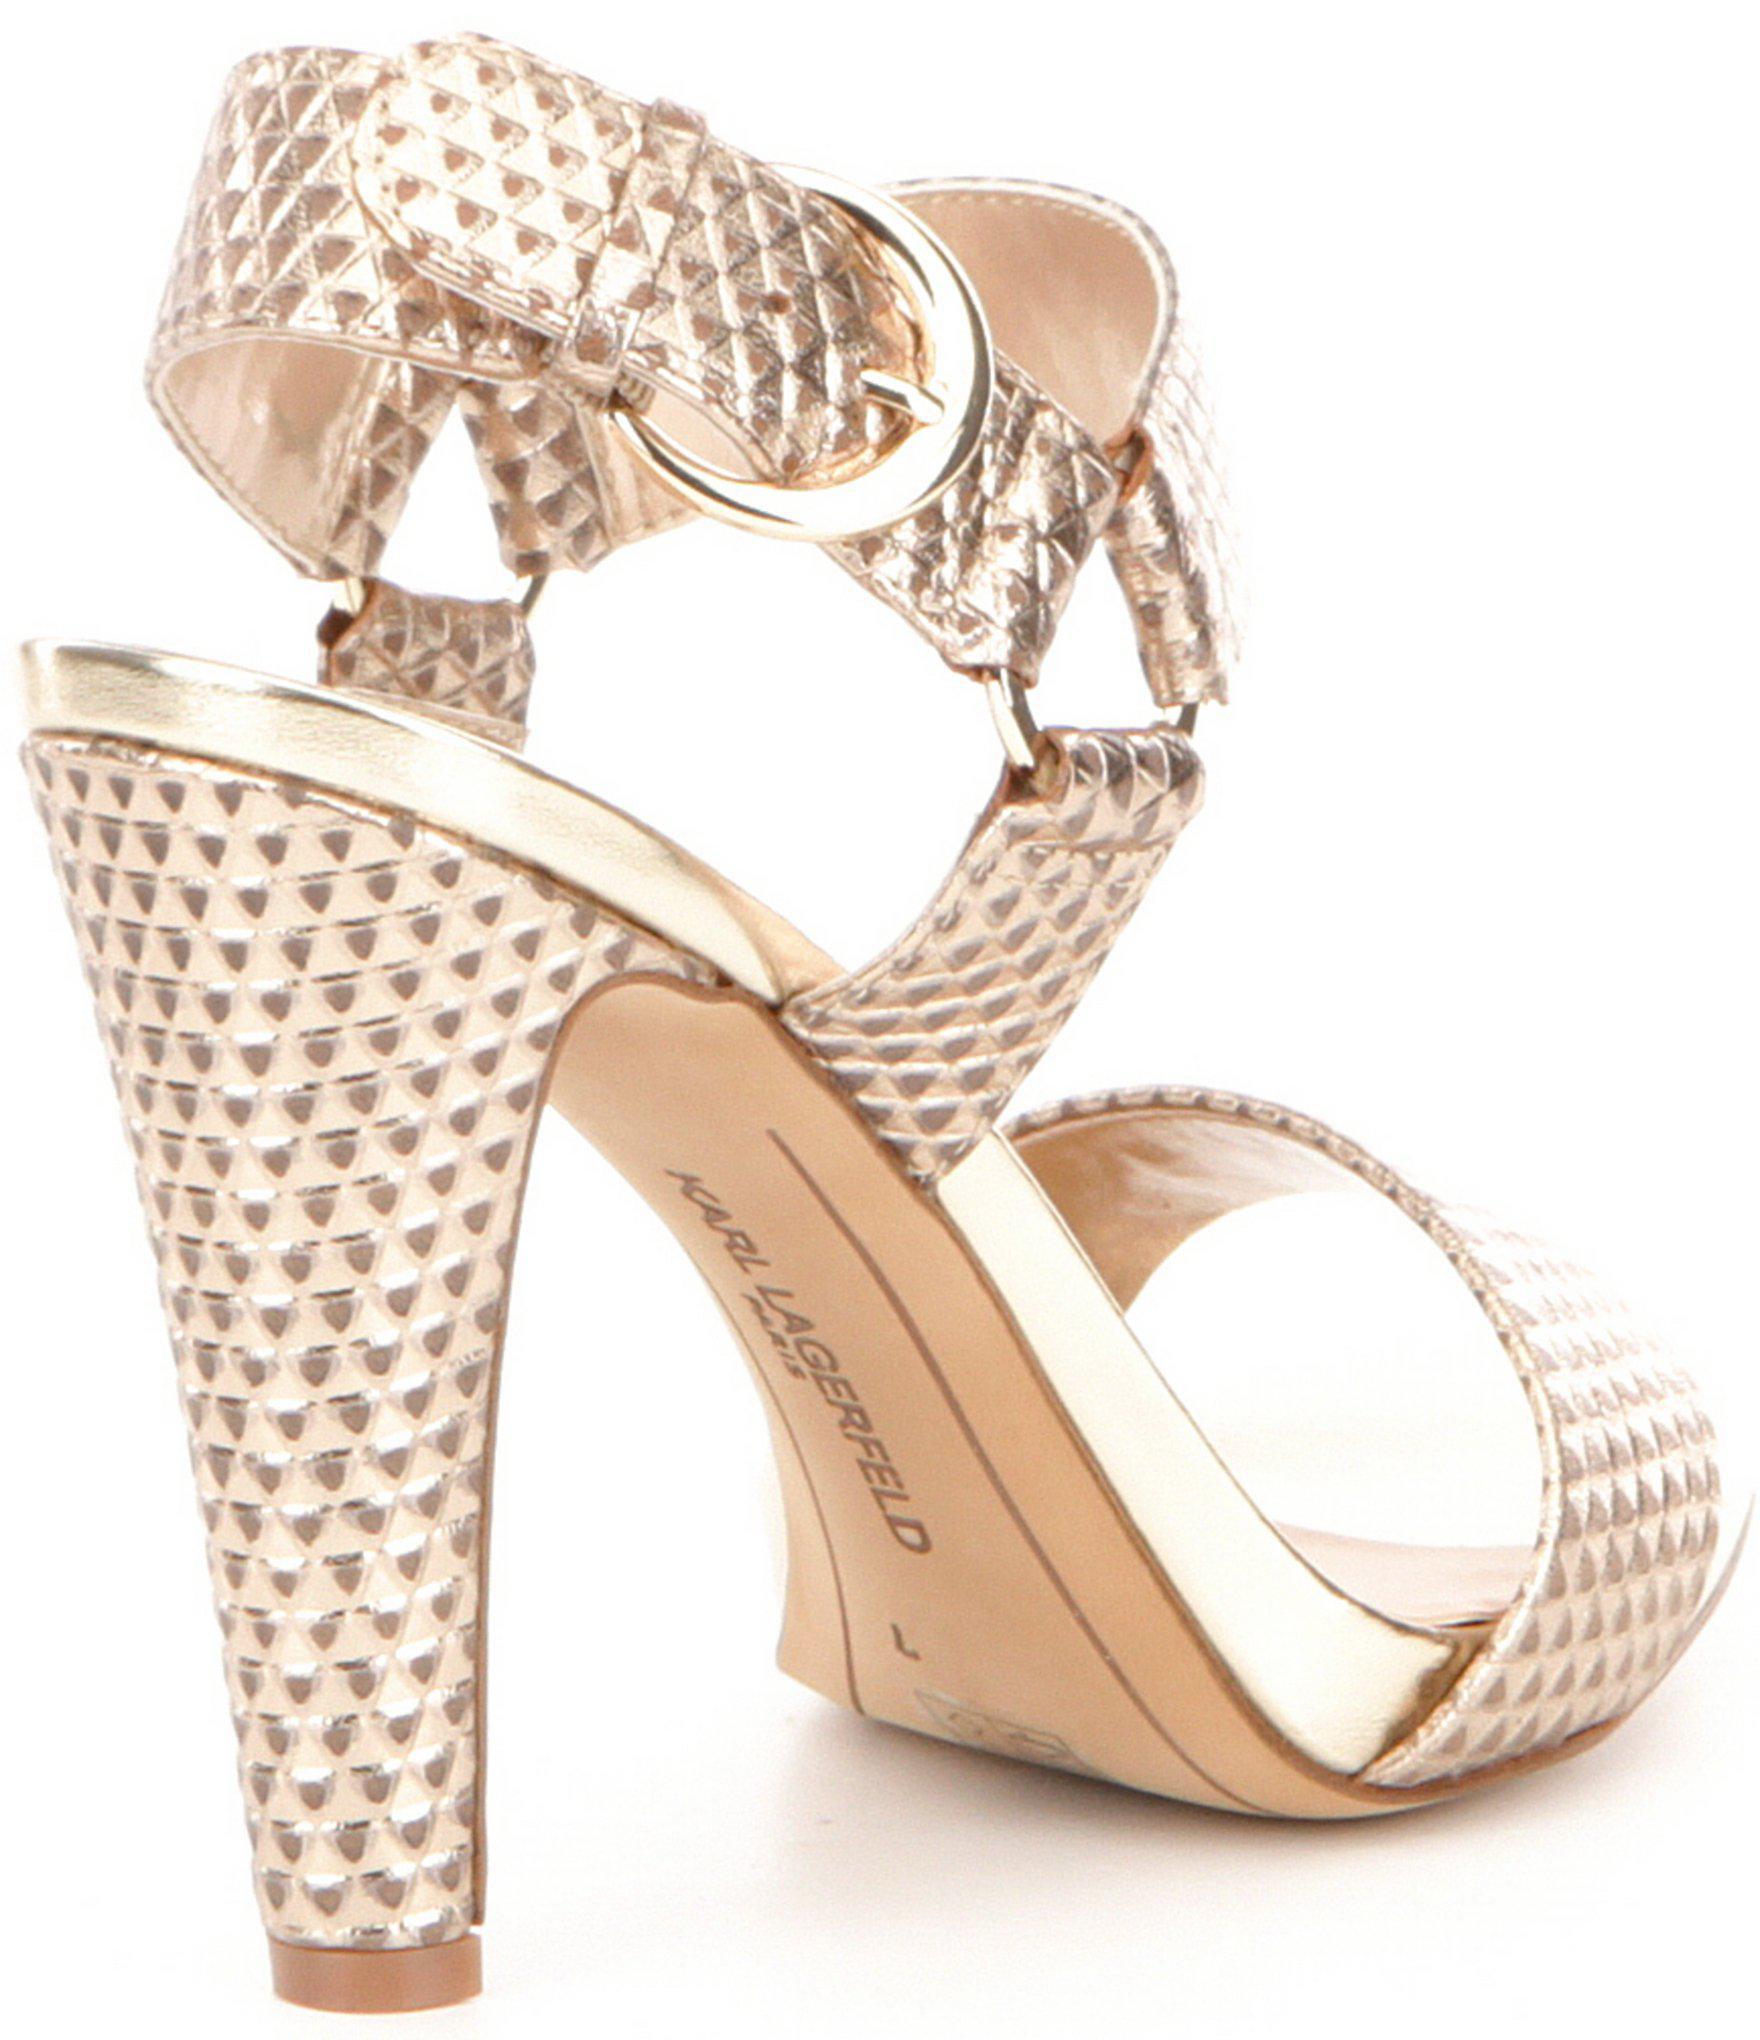 de1b4e17a7a Karl Lagerfeld - Cieone Metallic Leather Ankle Strap Dress Sandals - Lyst.  View fullscreen